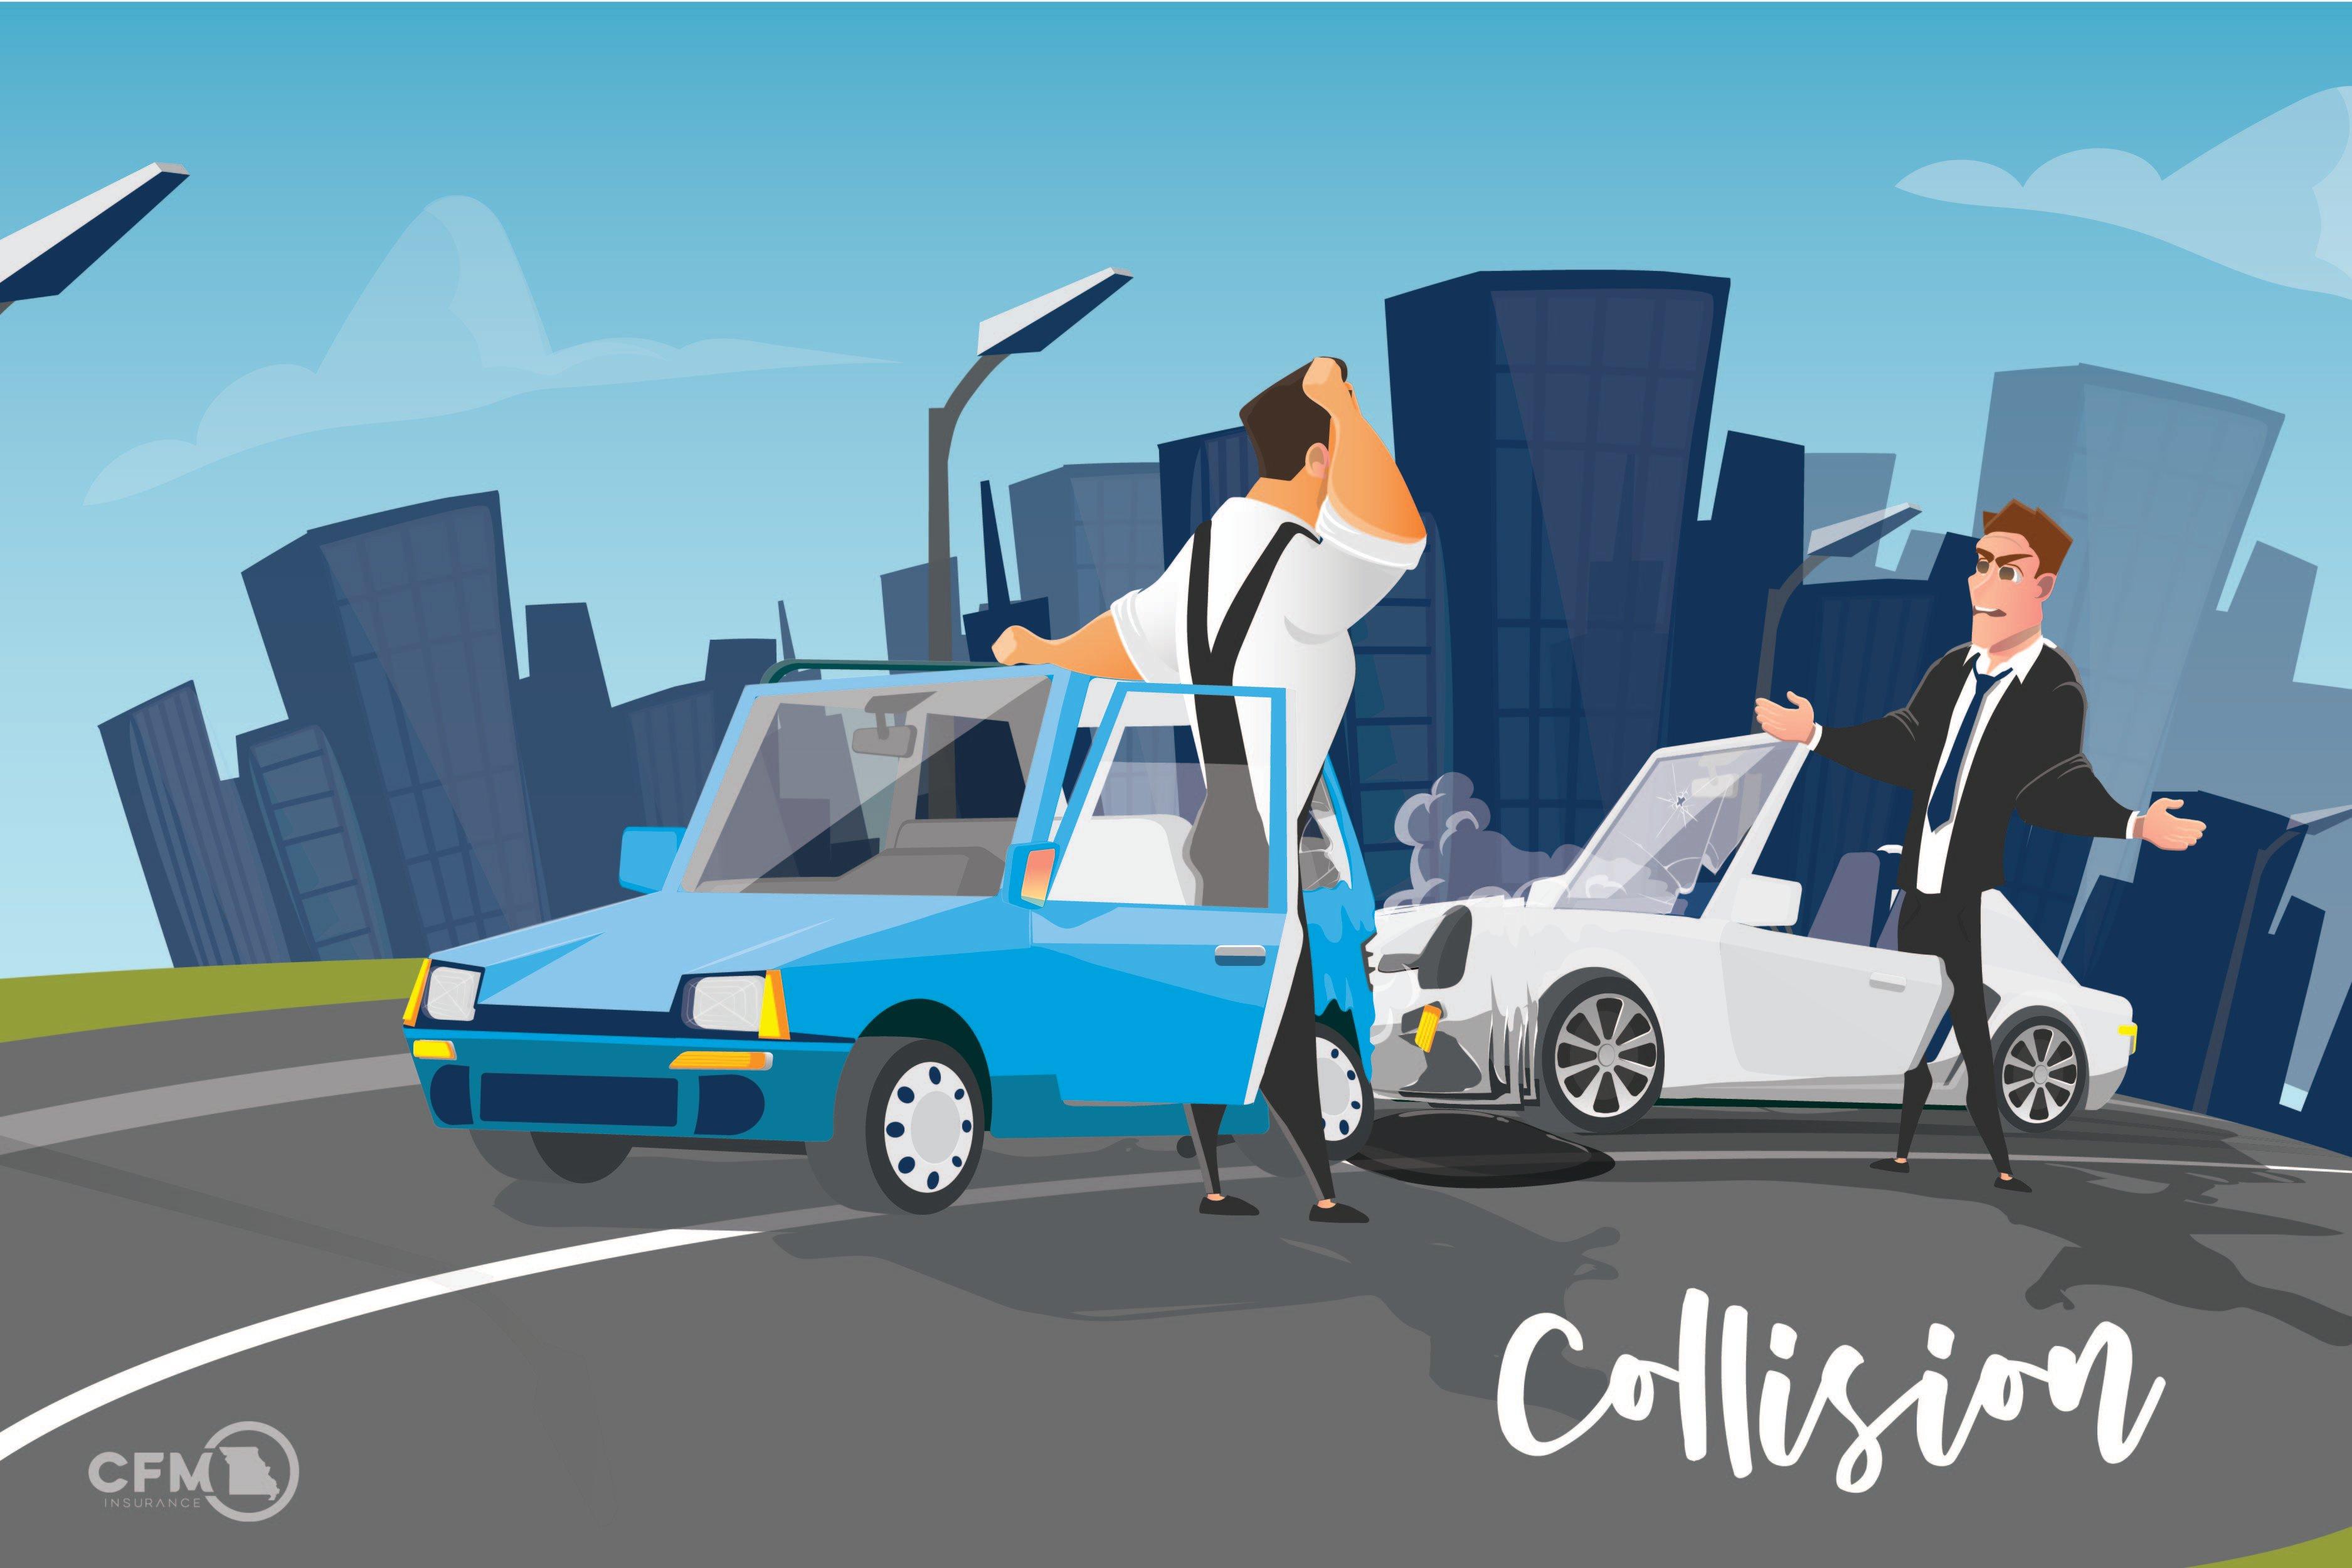 2. Collision_Blog_Title-01